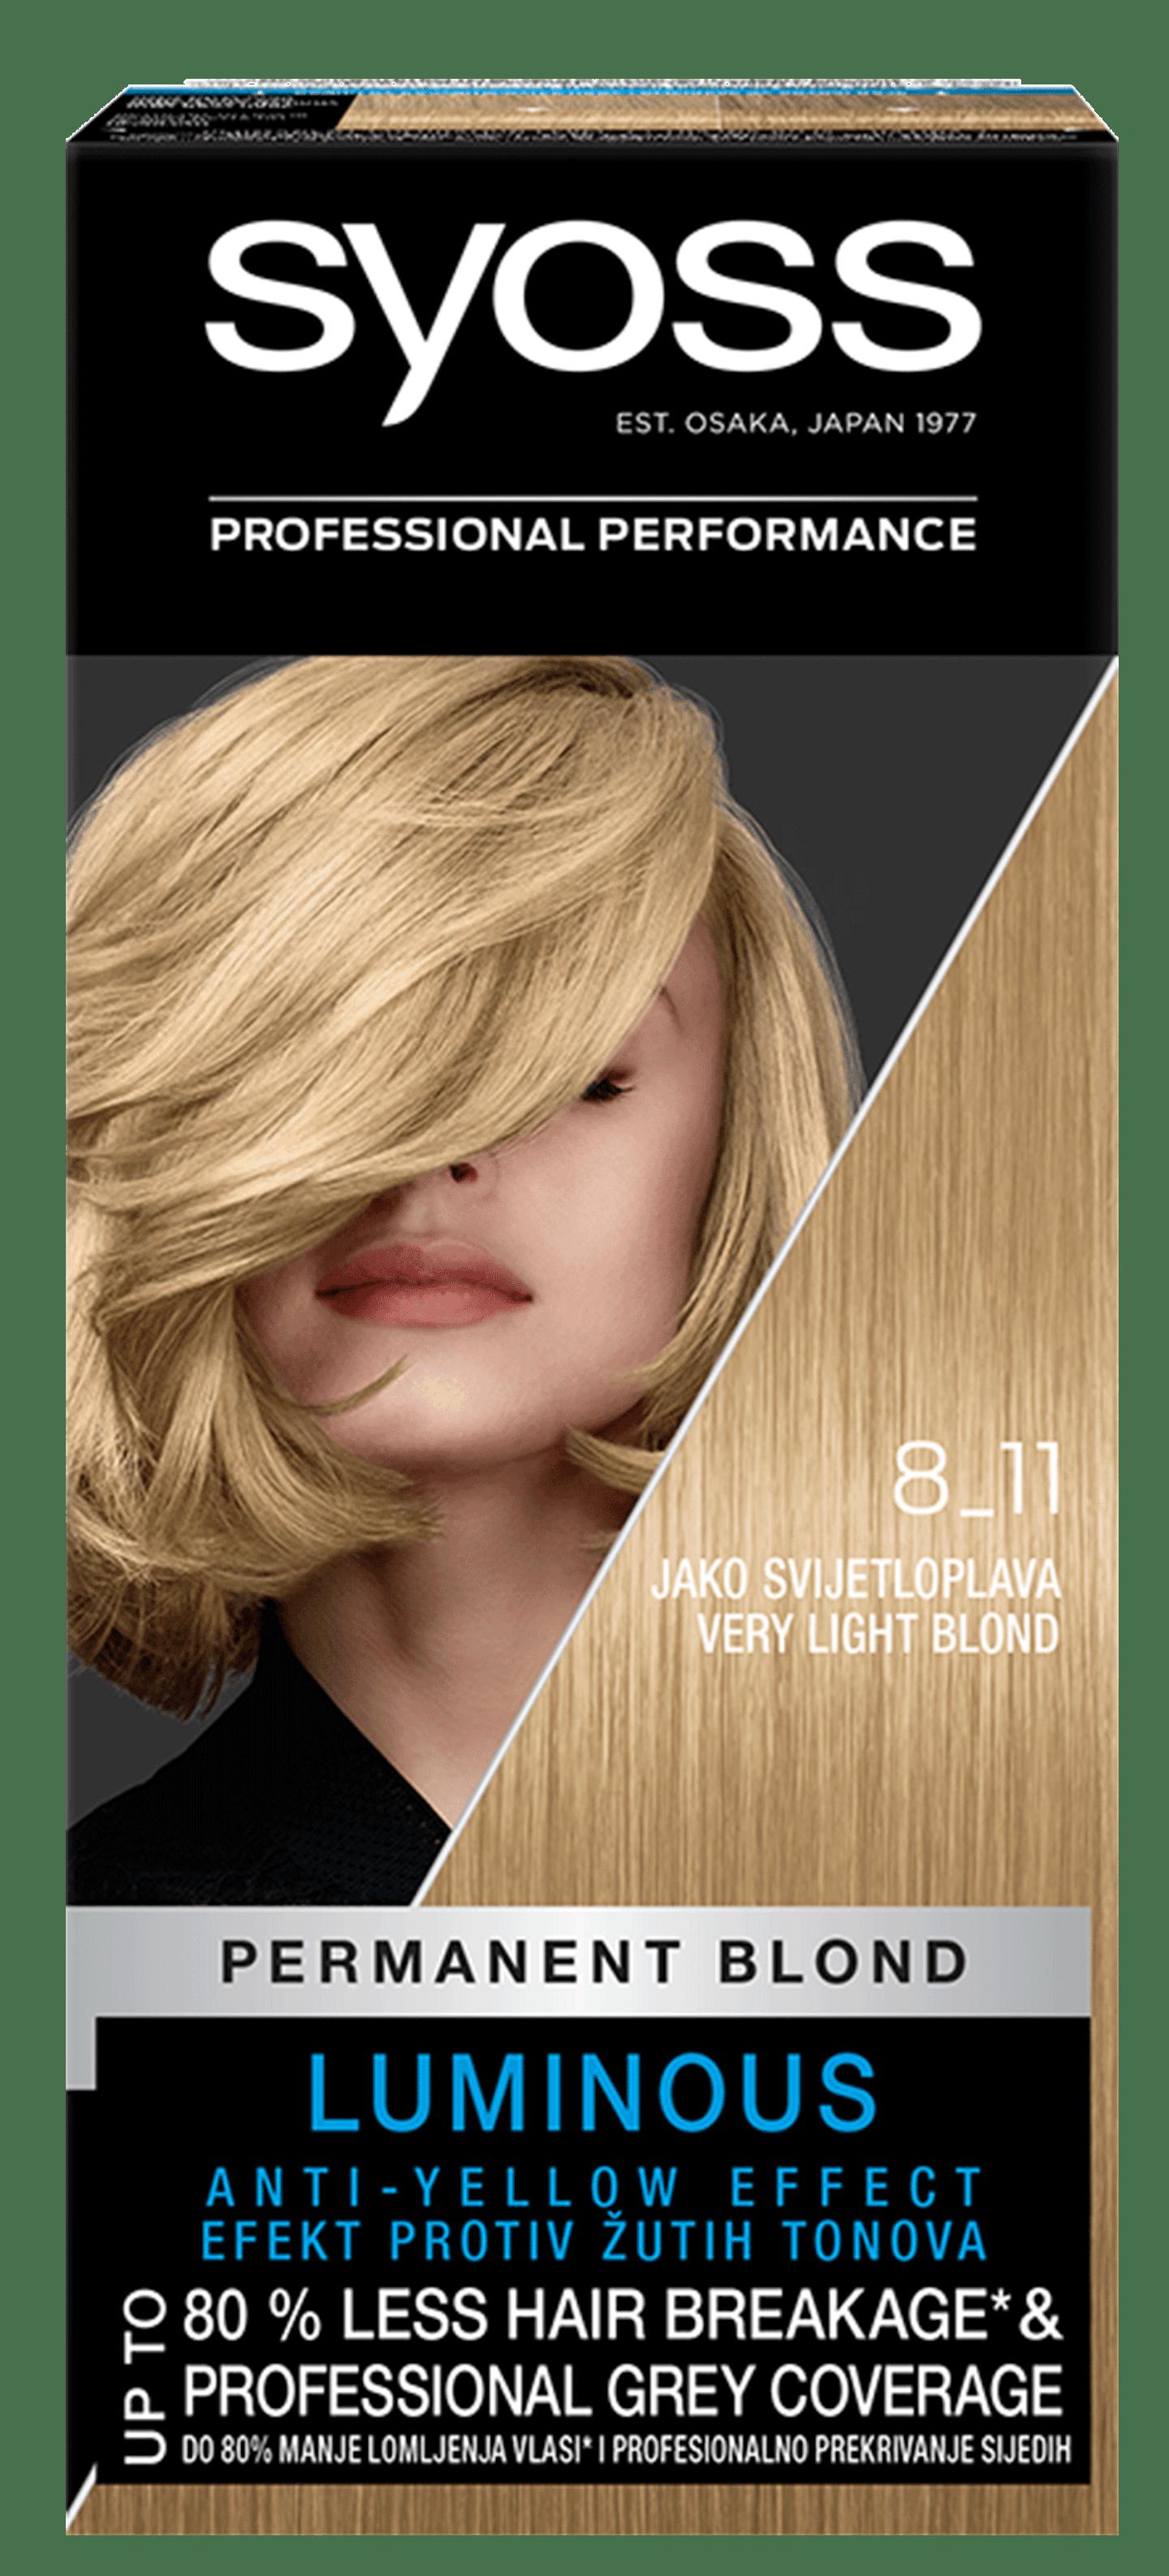 Trajna barva za lase Syoss Zelo svetlo blond 8-11